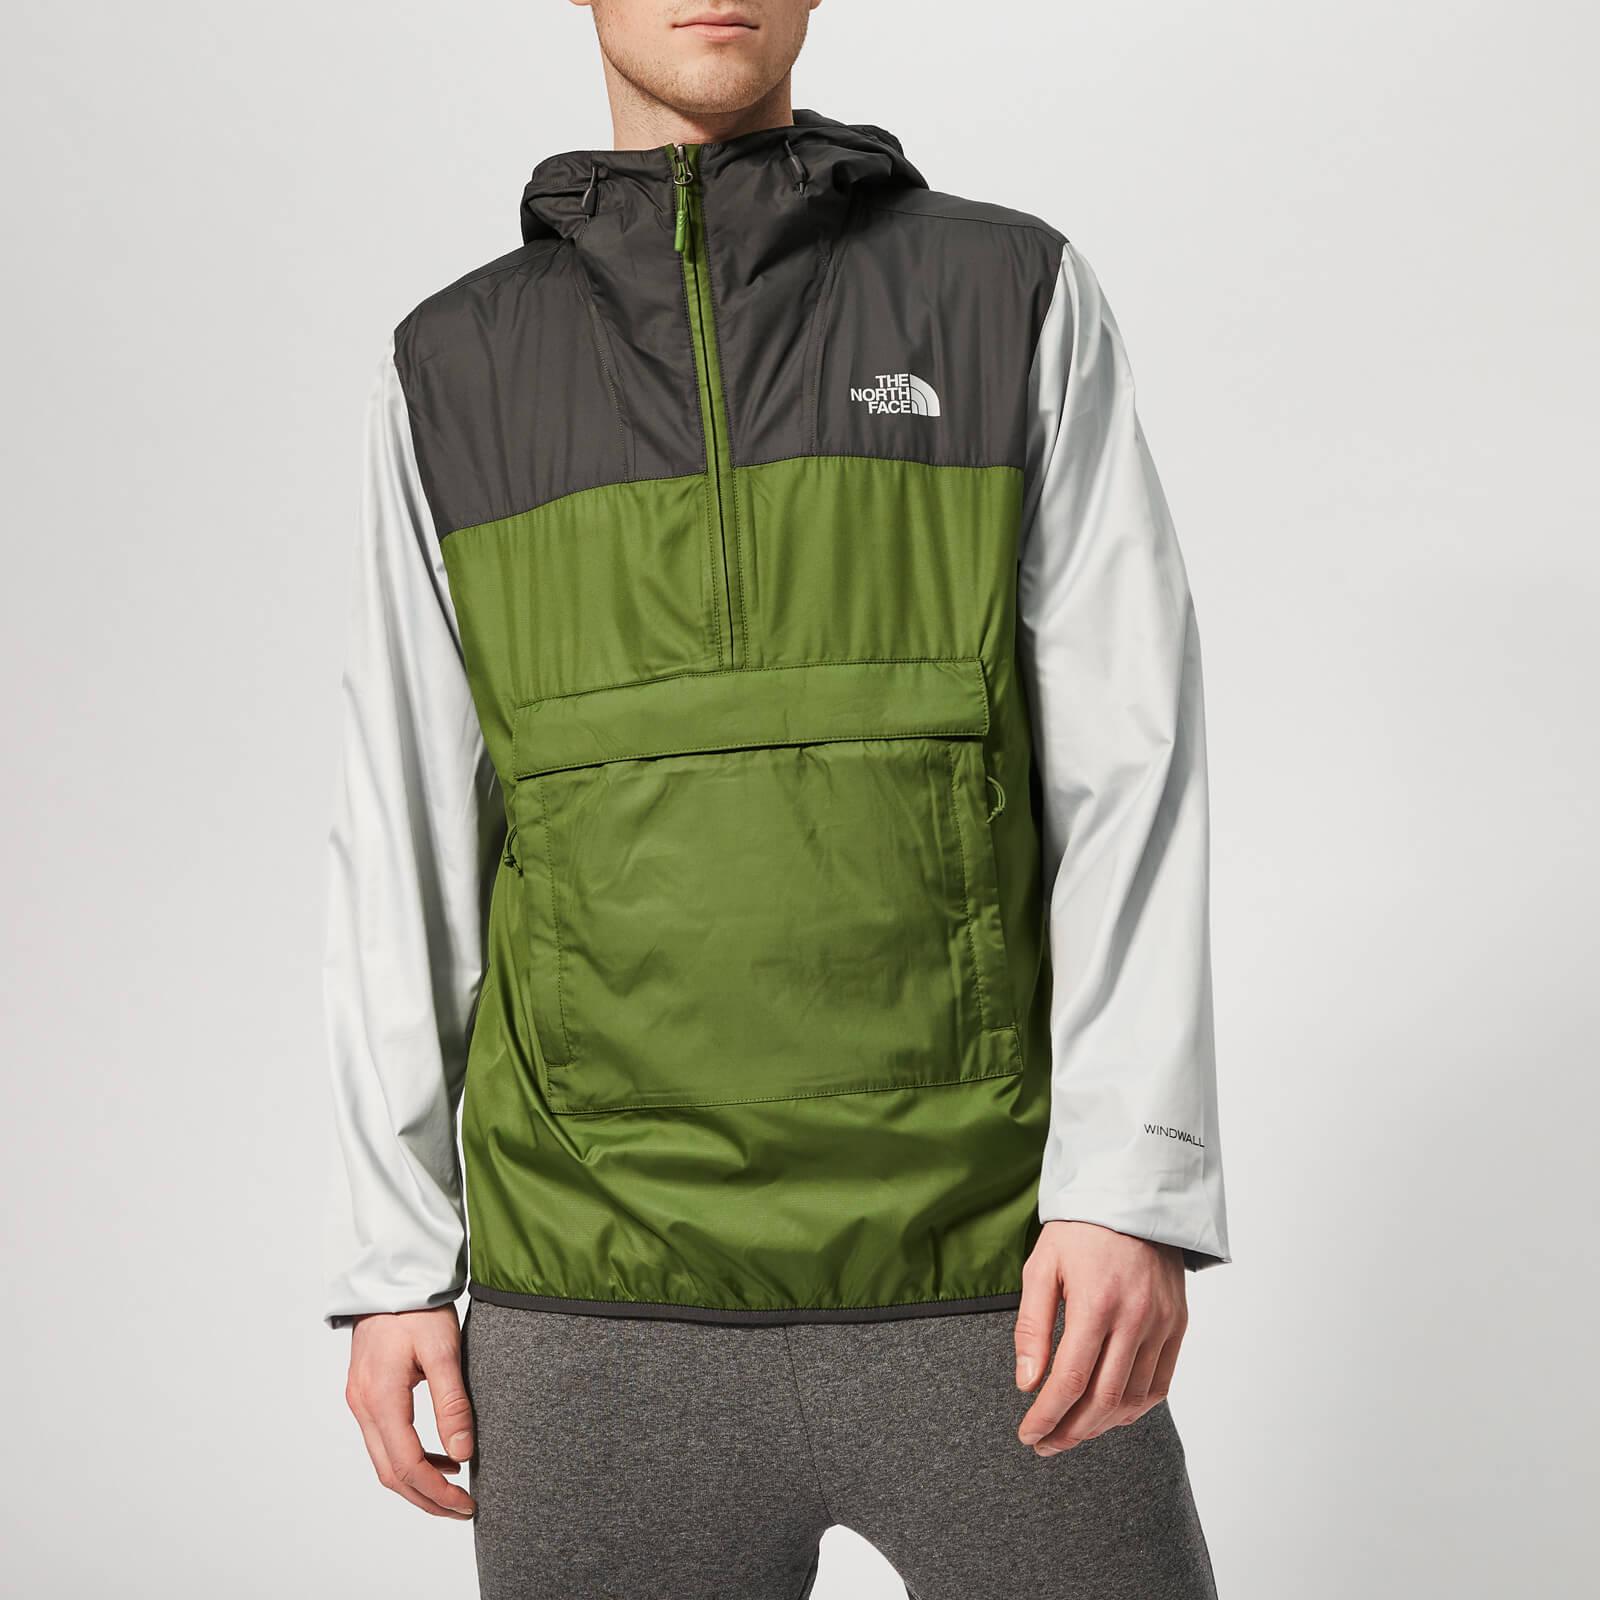 The North Face Men's Fanorak Jacket - Garden Green/Asphalt Grey - M